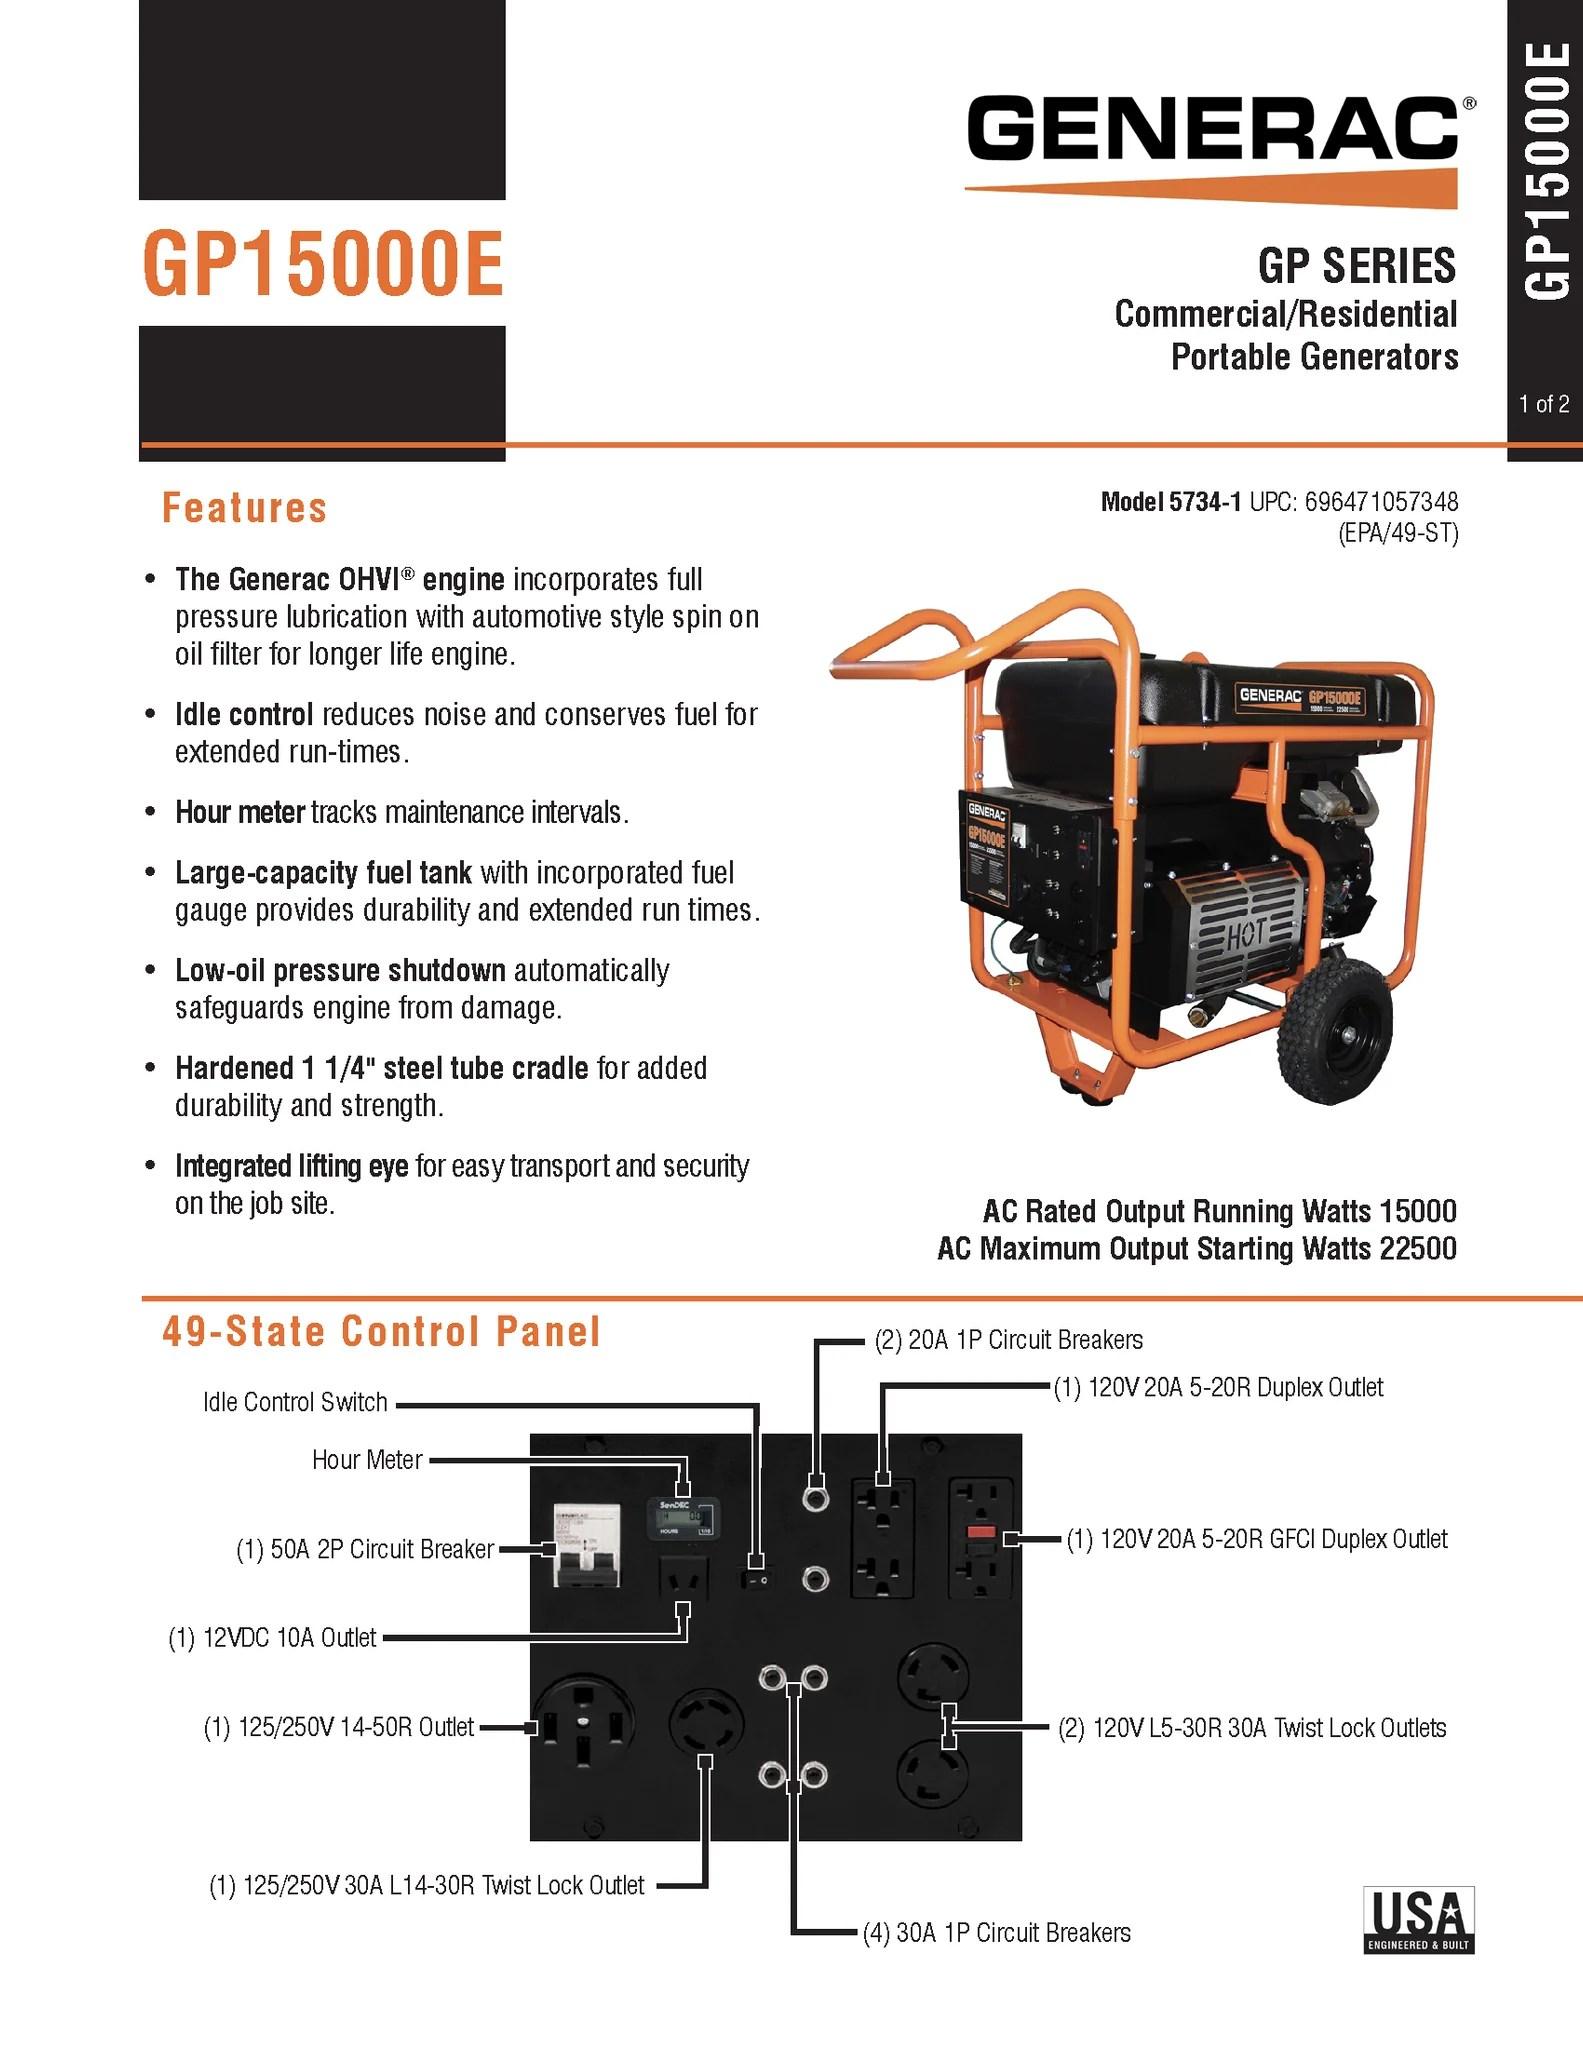 medium resolution of generac 5734 gp series gp15000e 15 000 watt 992 cc ohvi portable gas powered generator with electric start non carb compliant 12vdc 365 cca battery